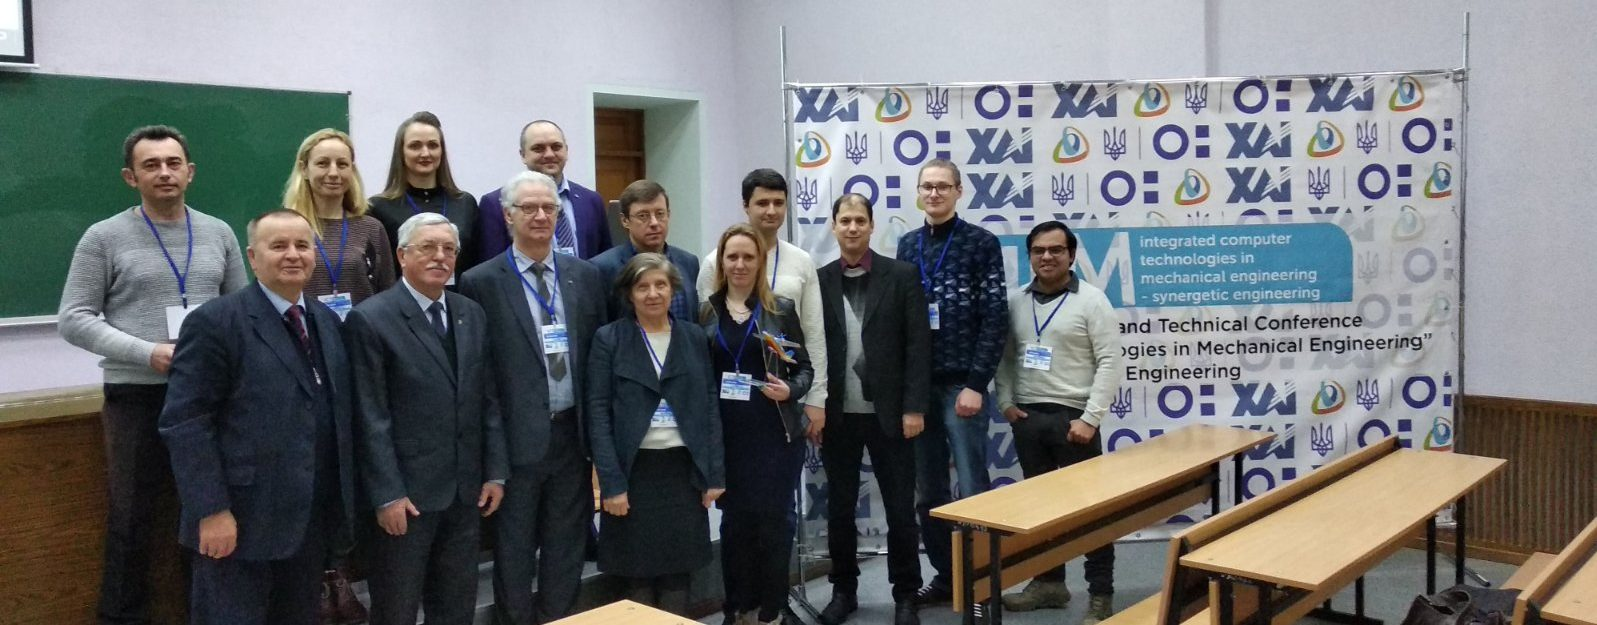 Industry 4.0 keynote presentation in ICTM Conference in Kharkiv